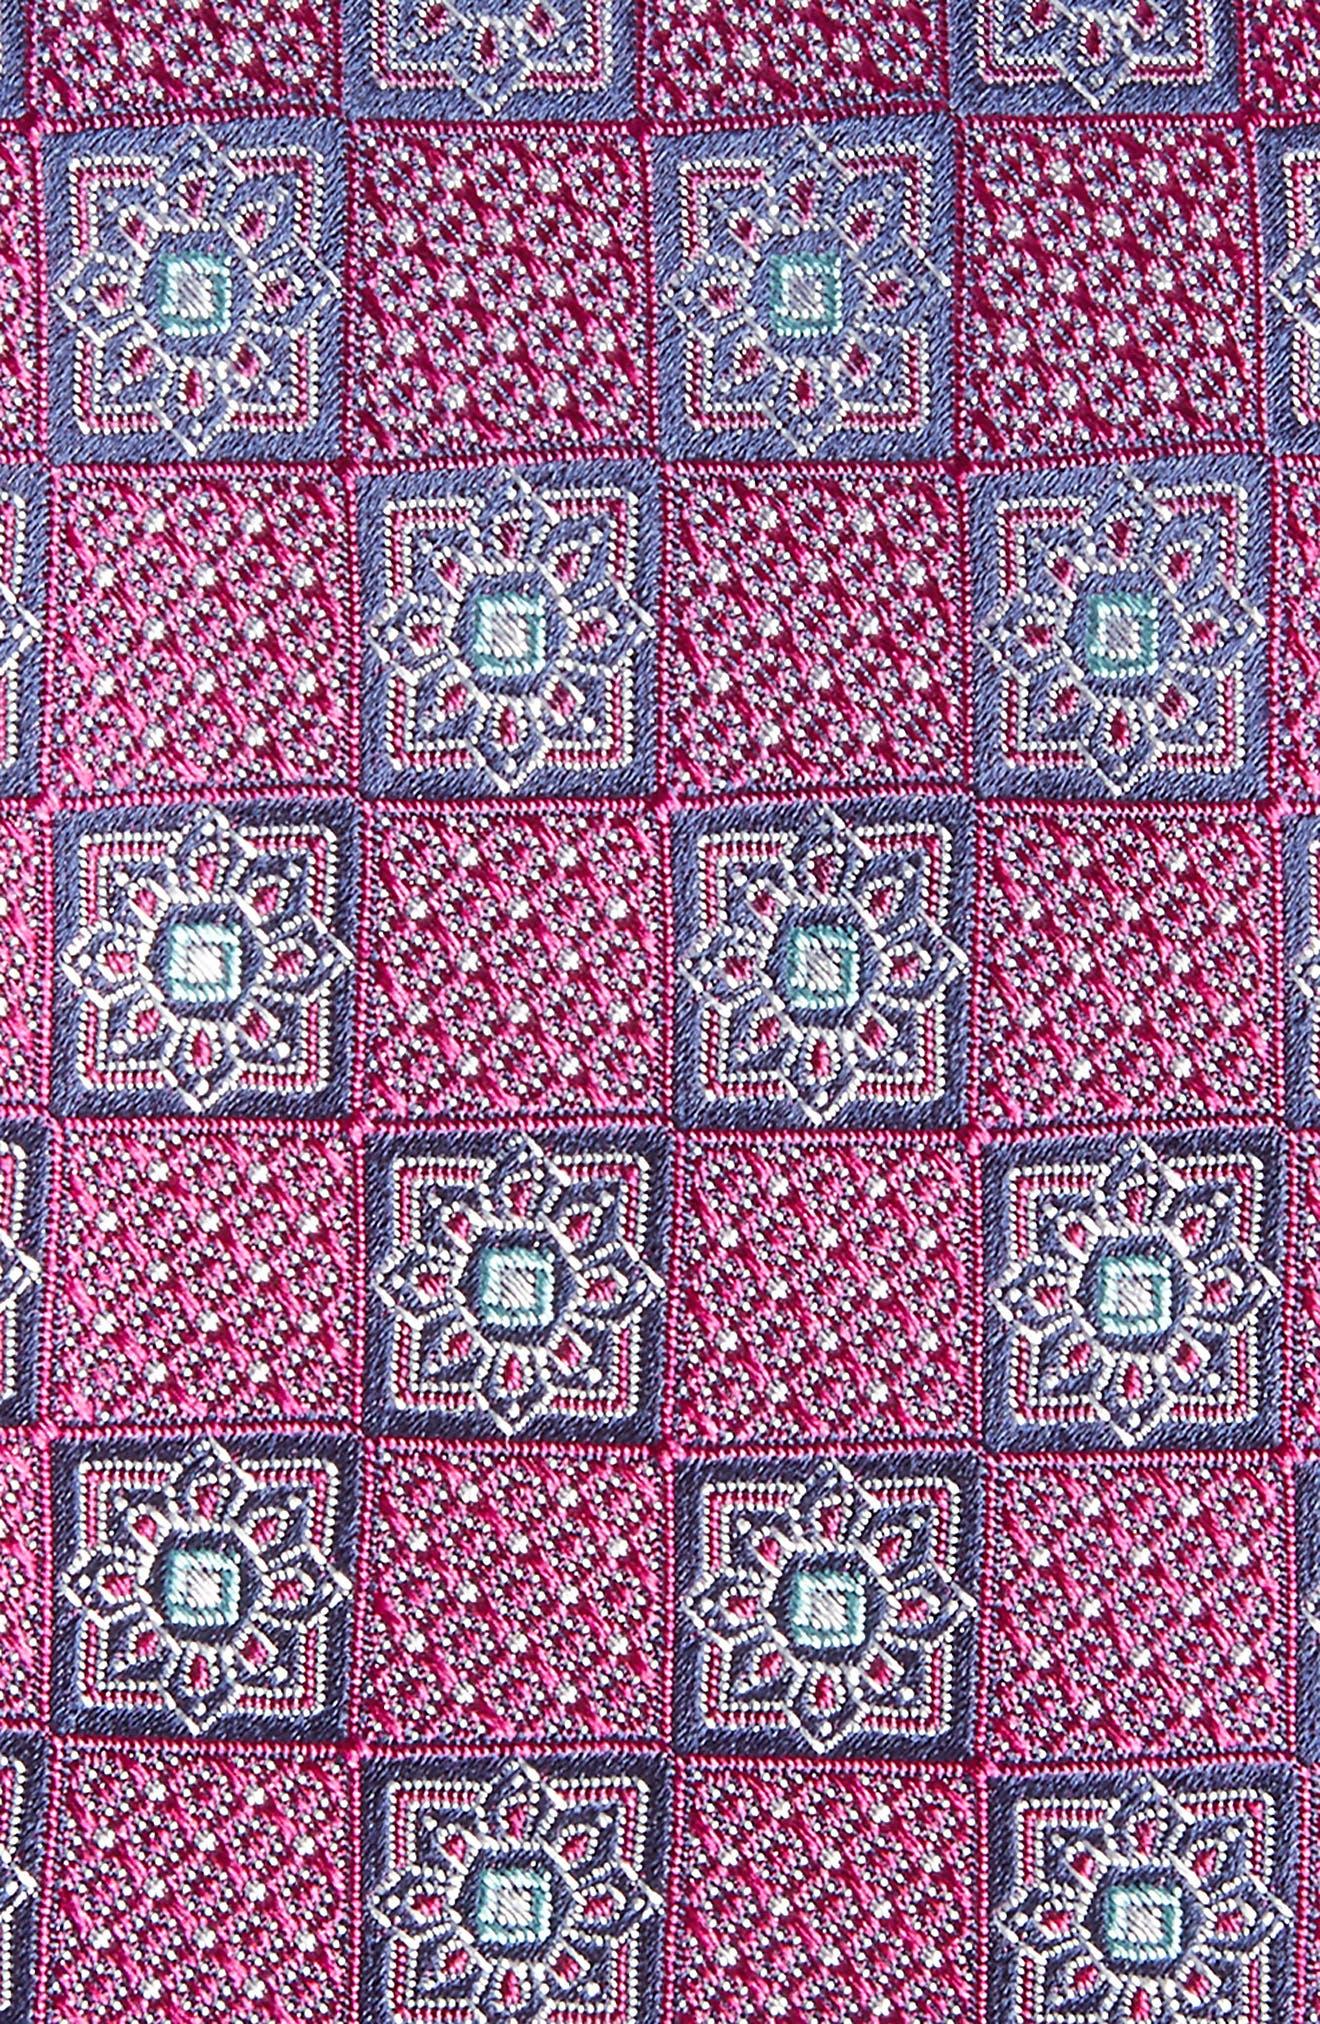 Settala Medallion Silk Tie,                             Alternate thumbnail 2, color,                             Magenta